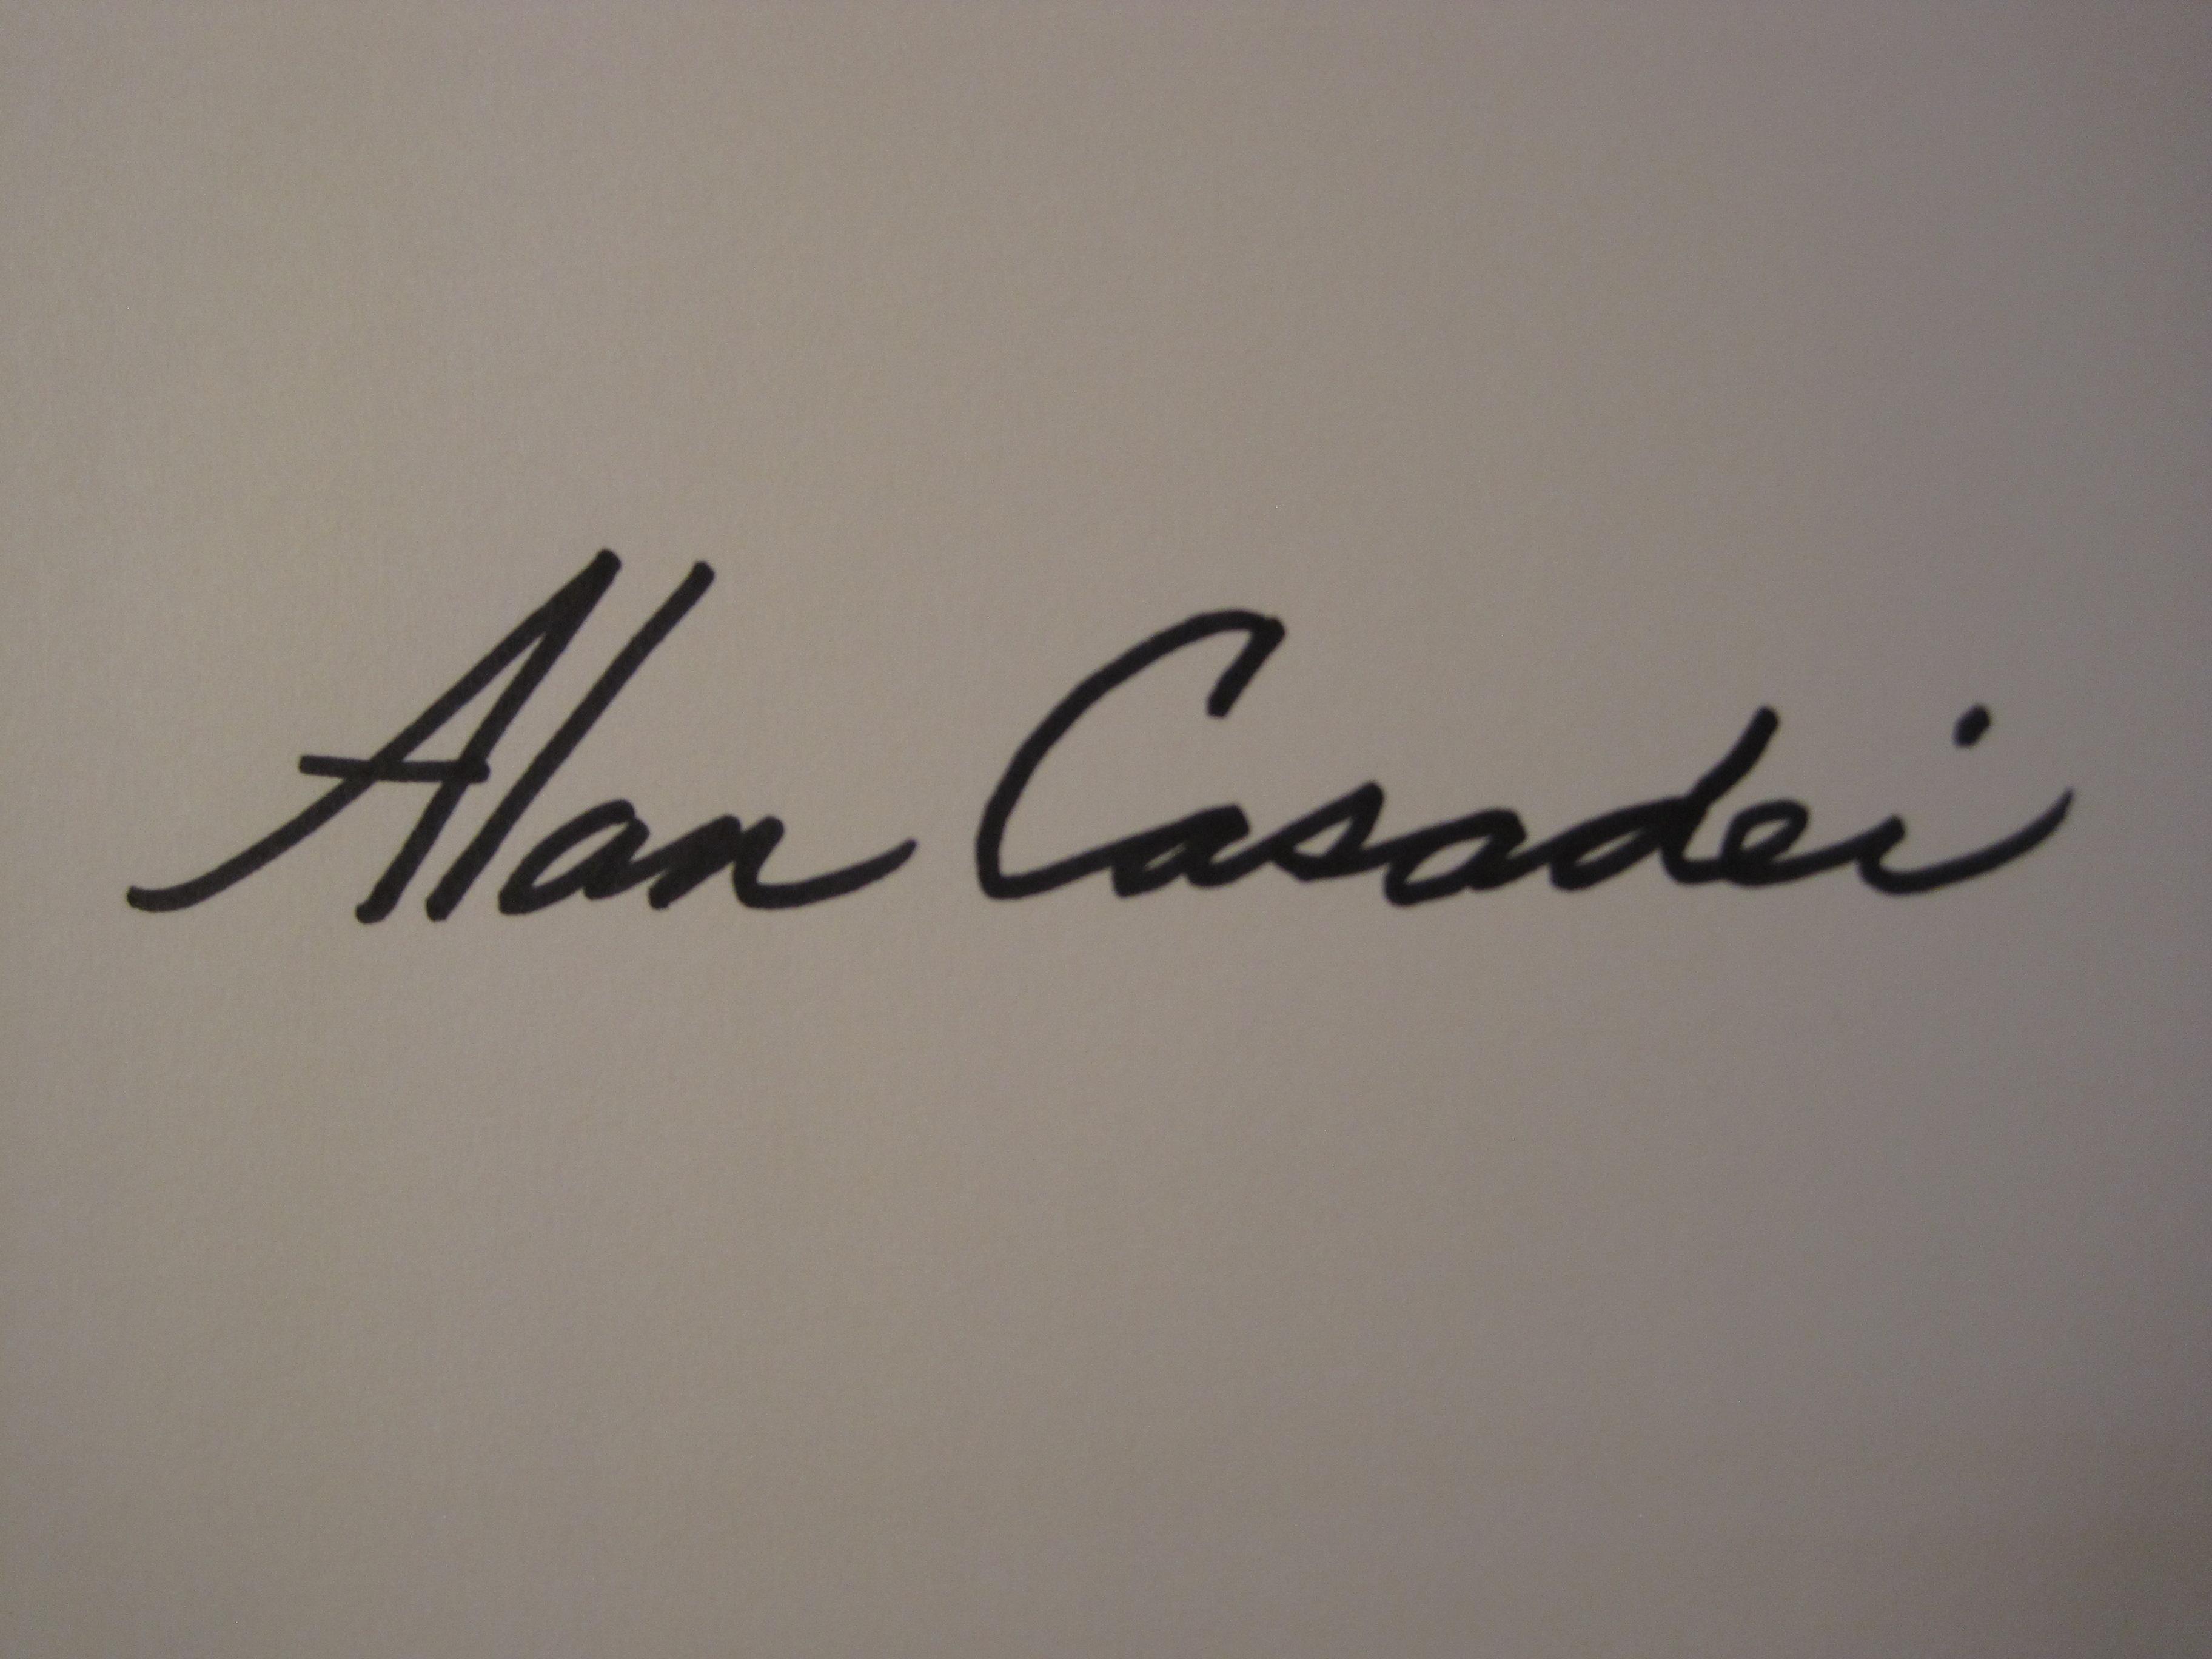 Alan Casadei's Signature